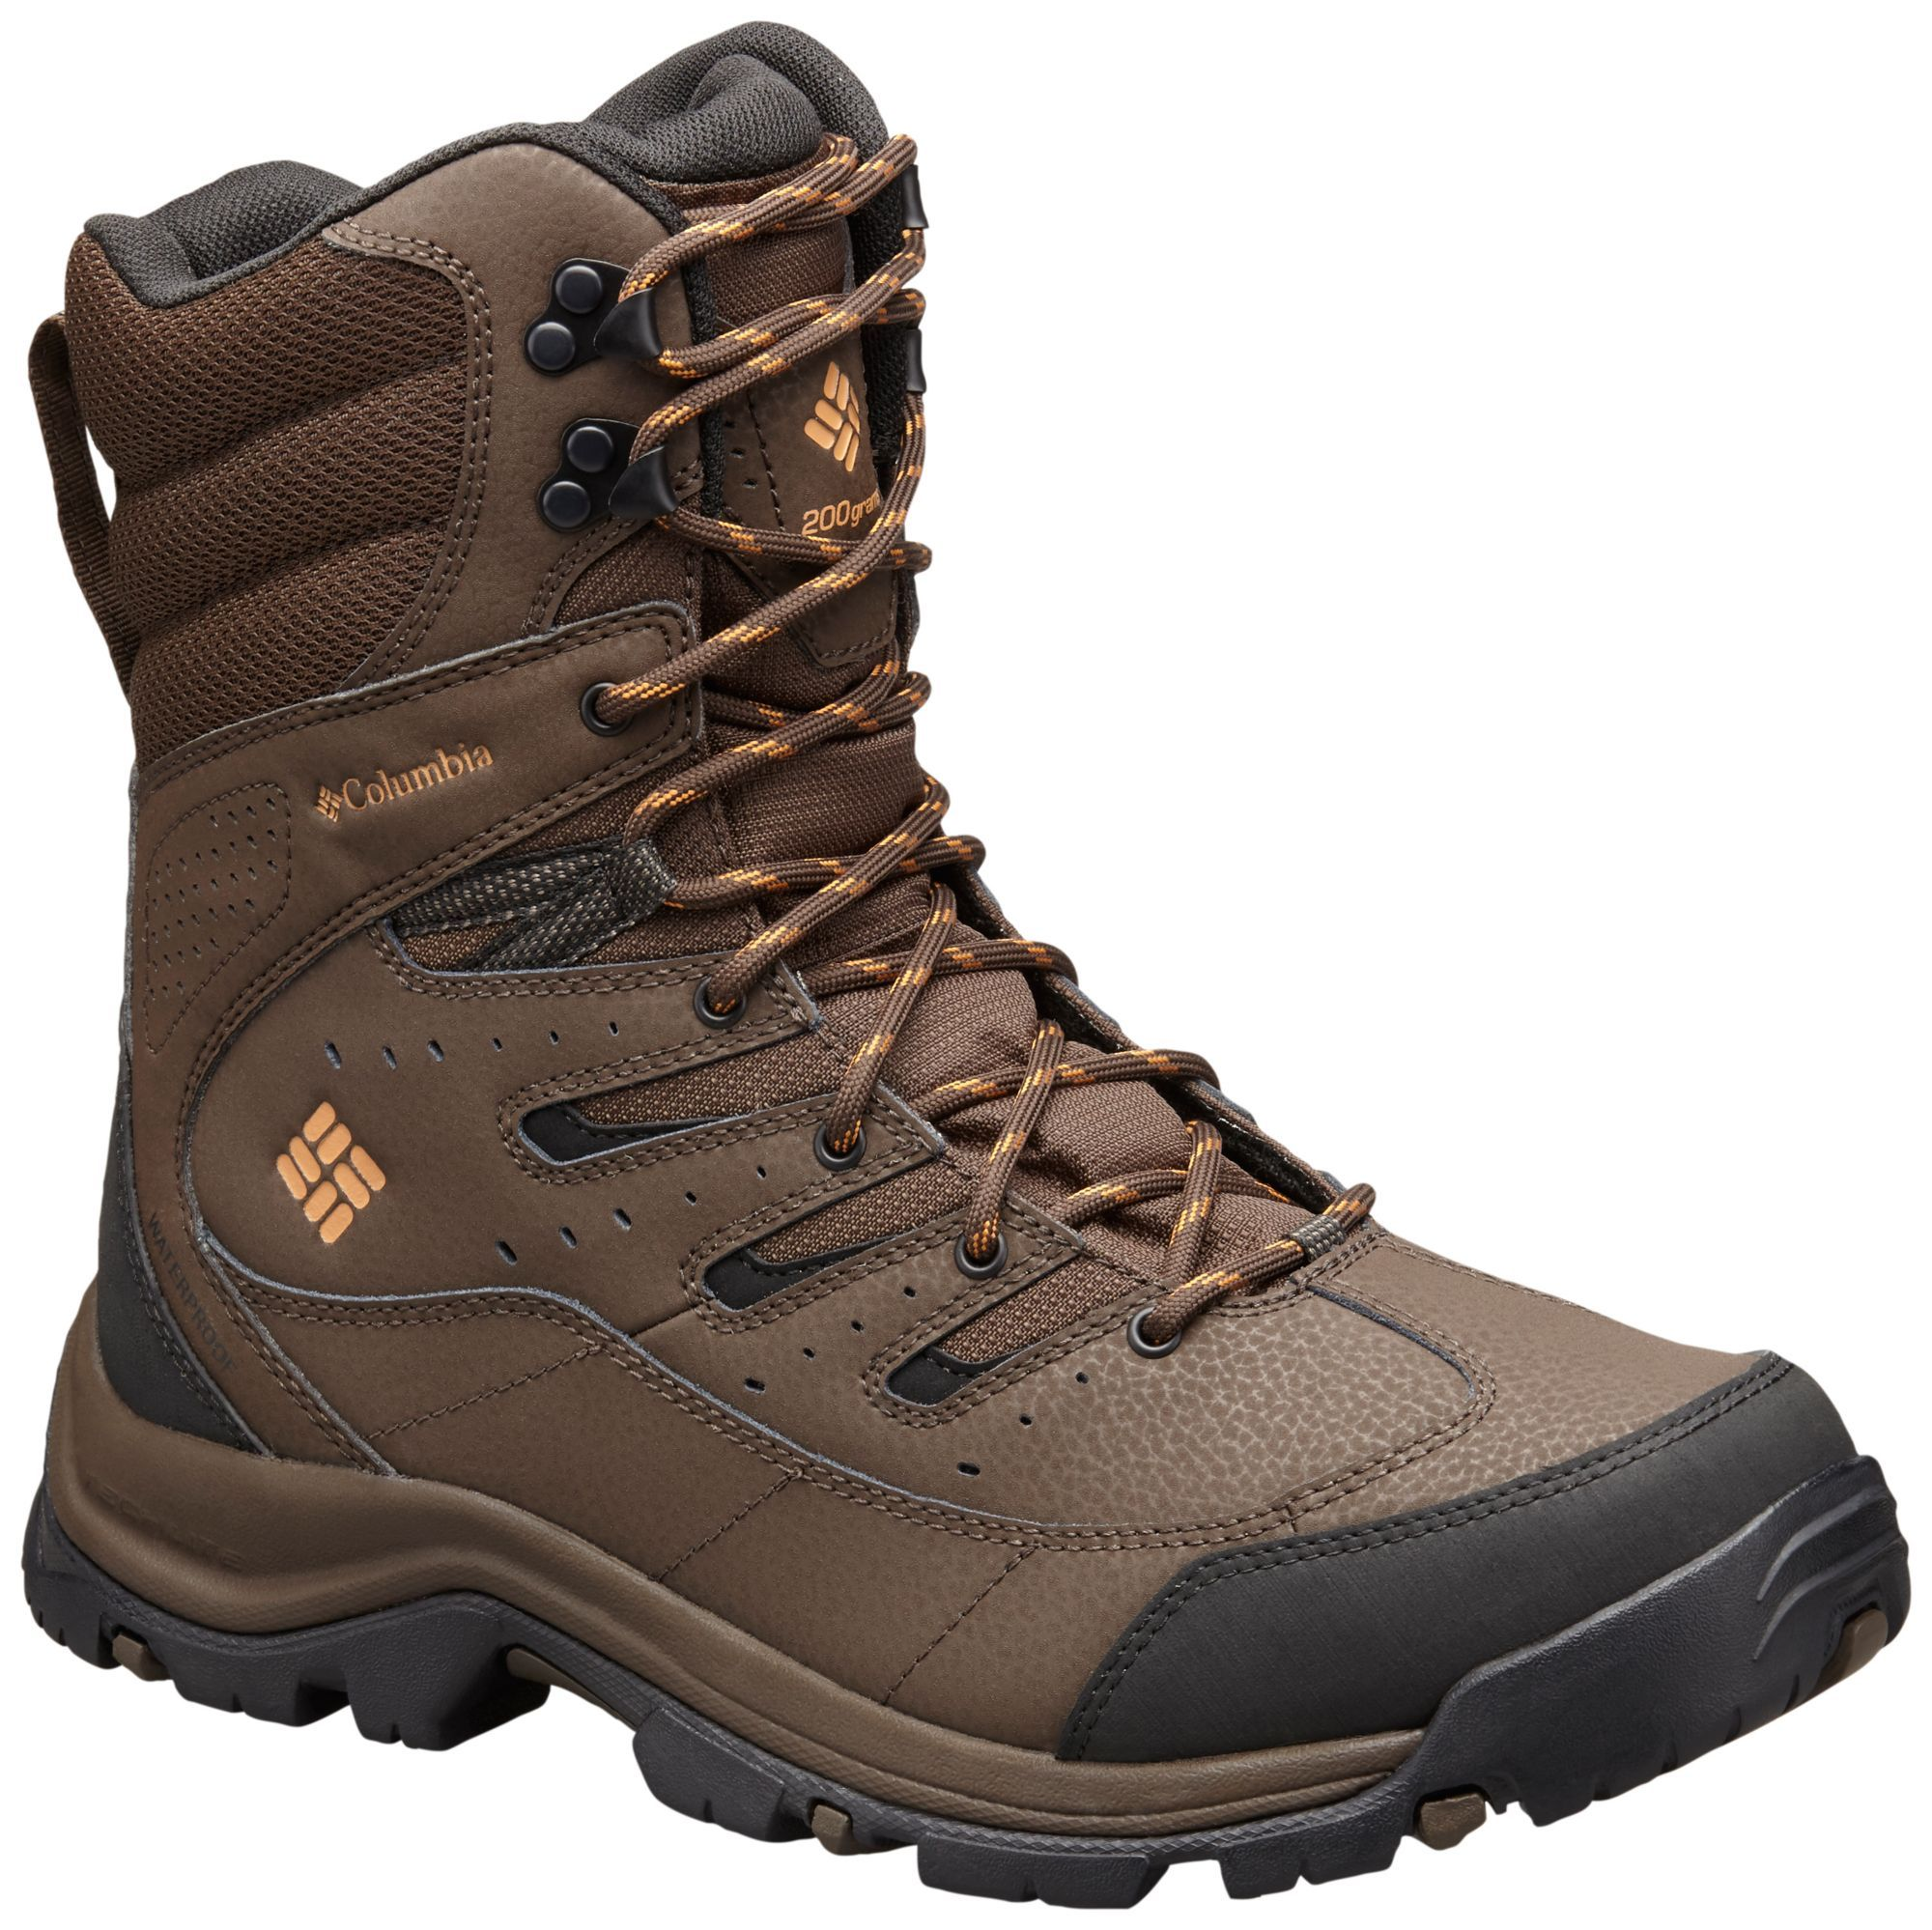 4bb66ac72ca Columbia Men's Gunnison Plus 200g Waterproof Winter Boots | Products ...